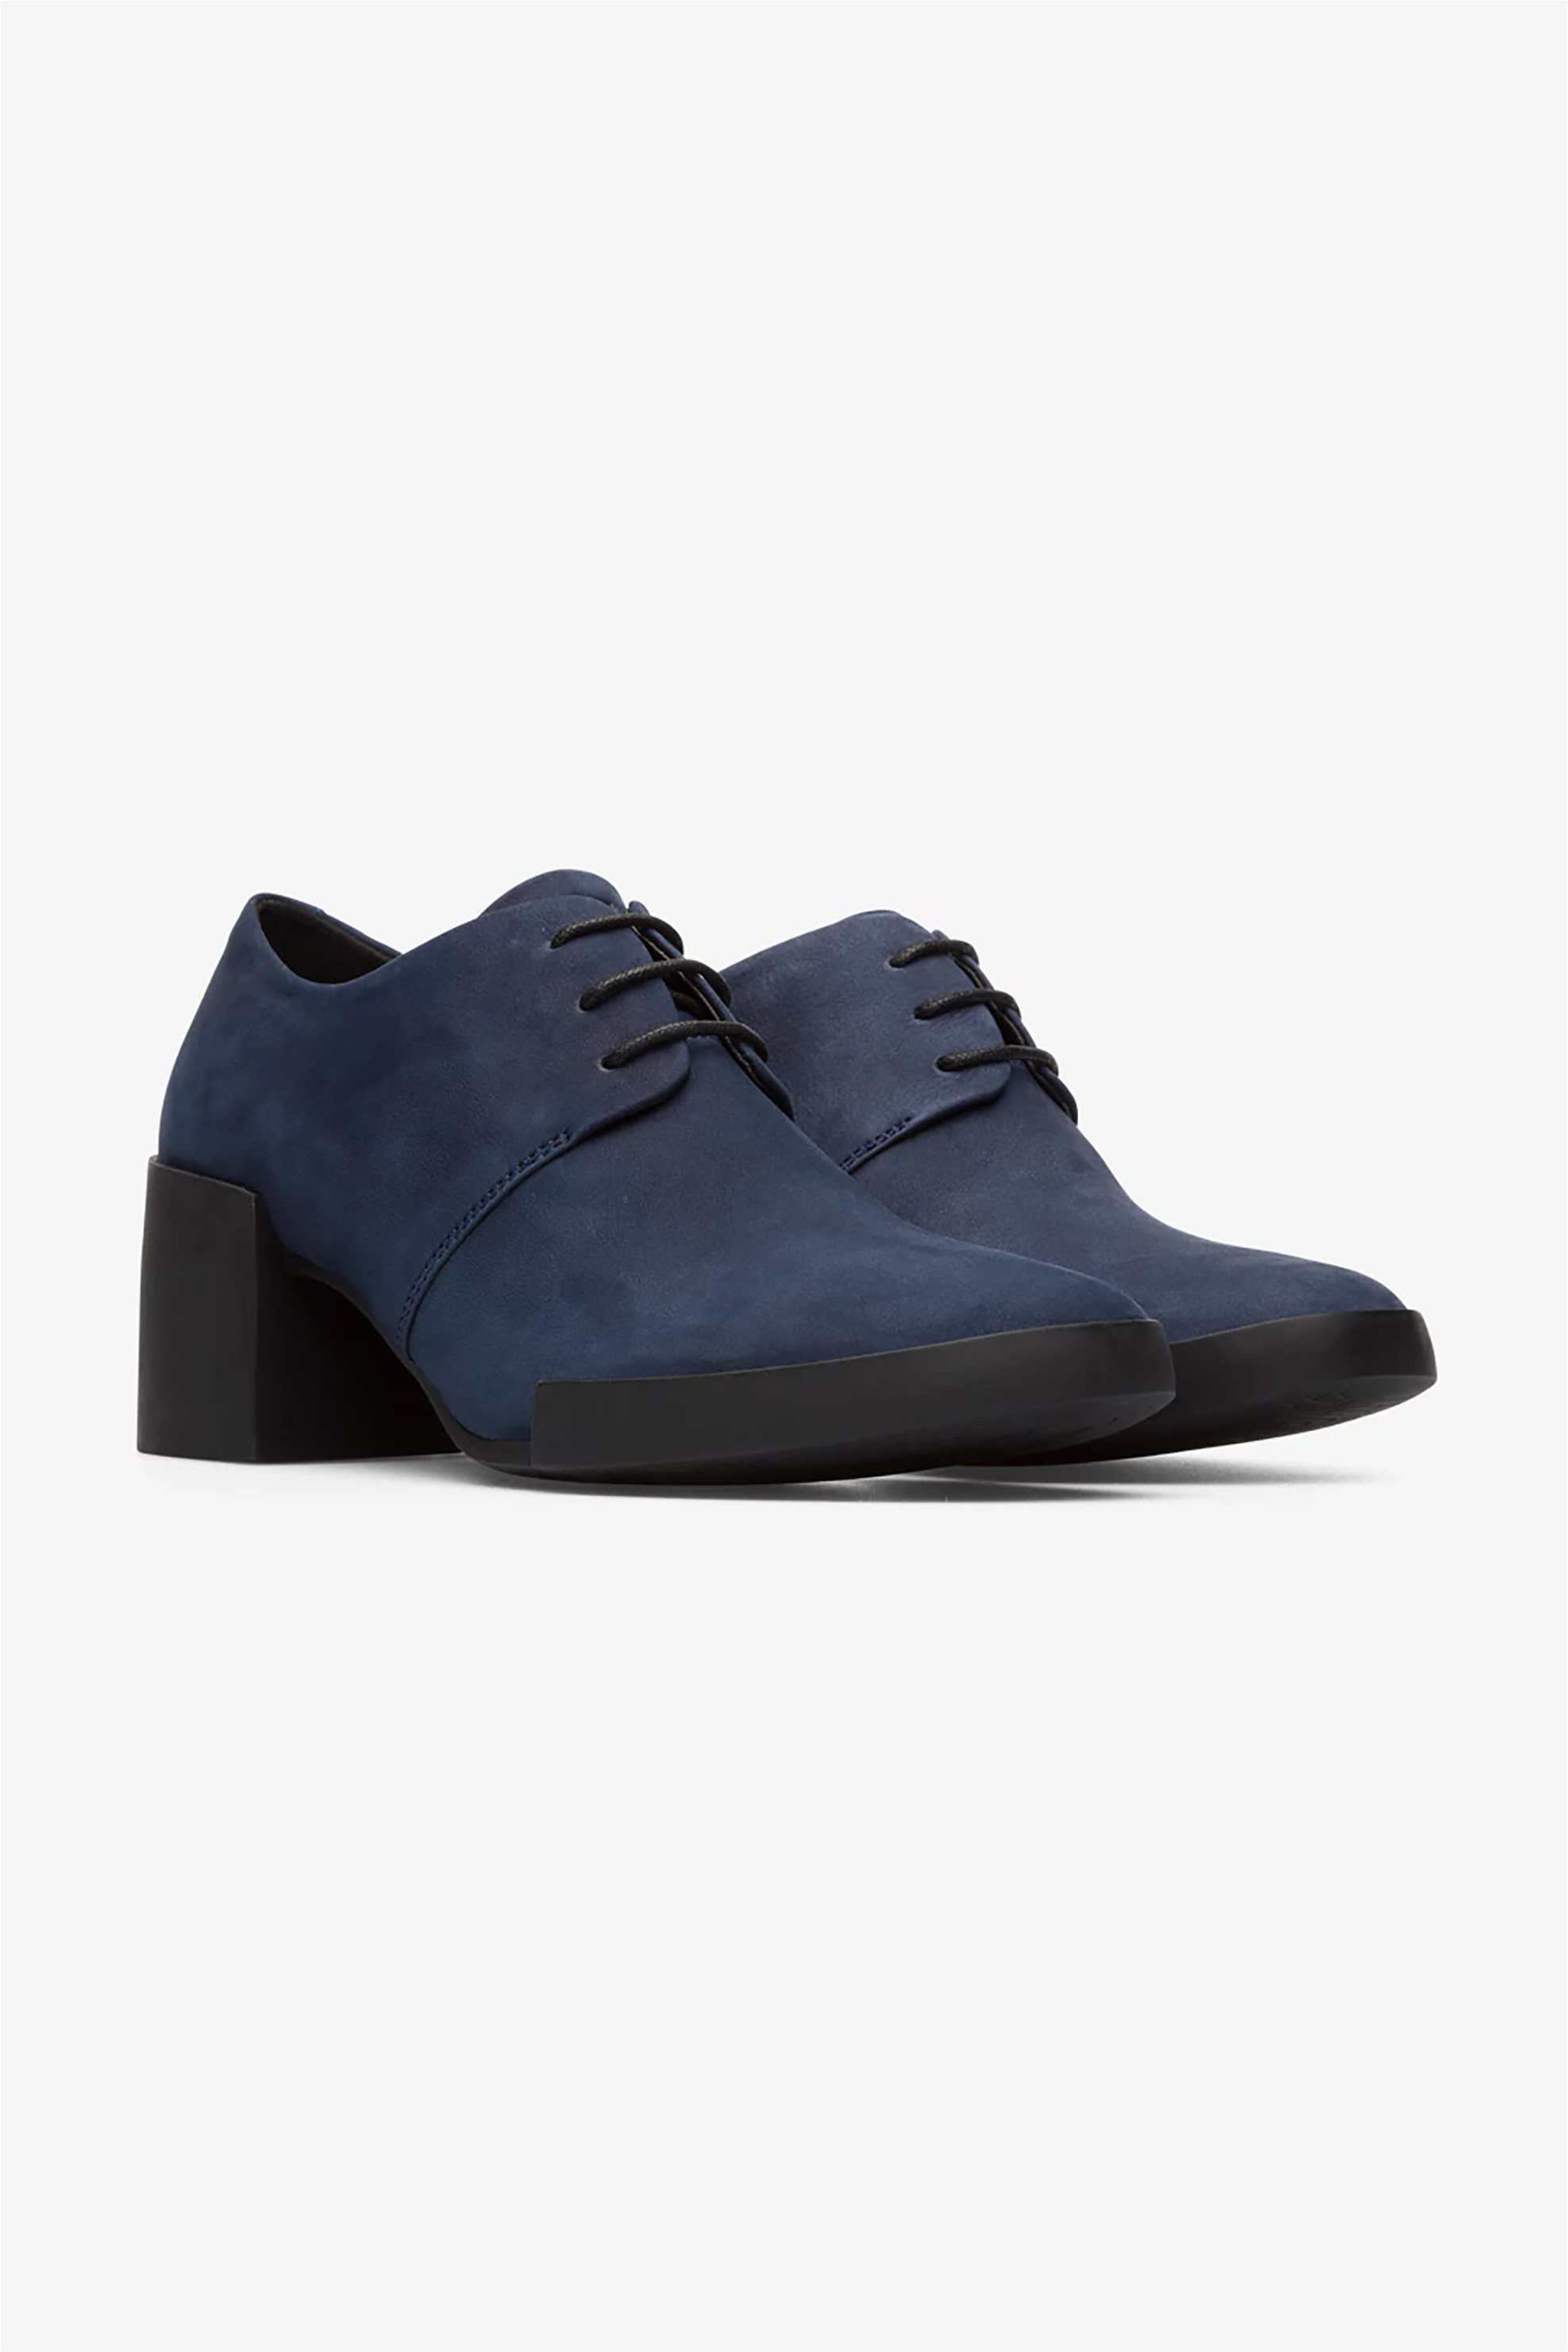 "Camper γυναικεία Oxford με τακούνι ""Lotta"" – K200917-003 – Μπλε Σκούρο"